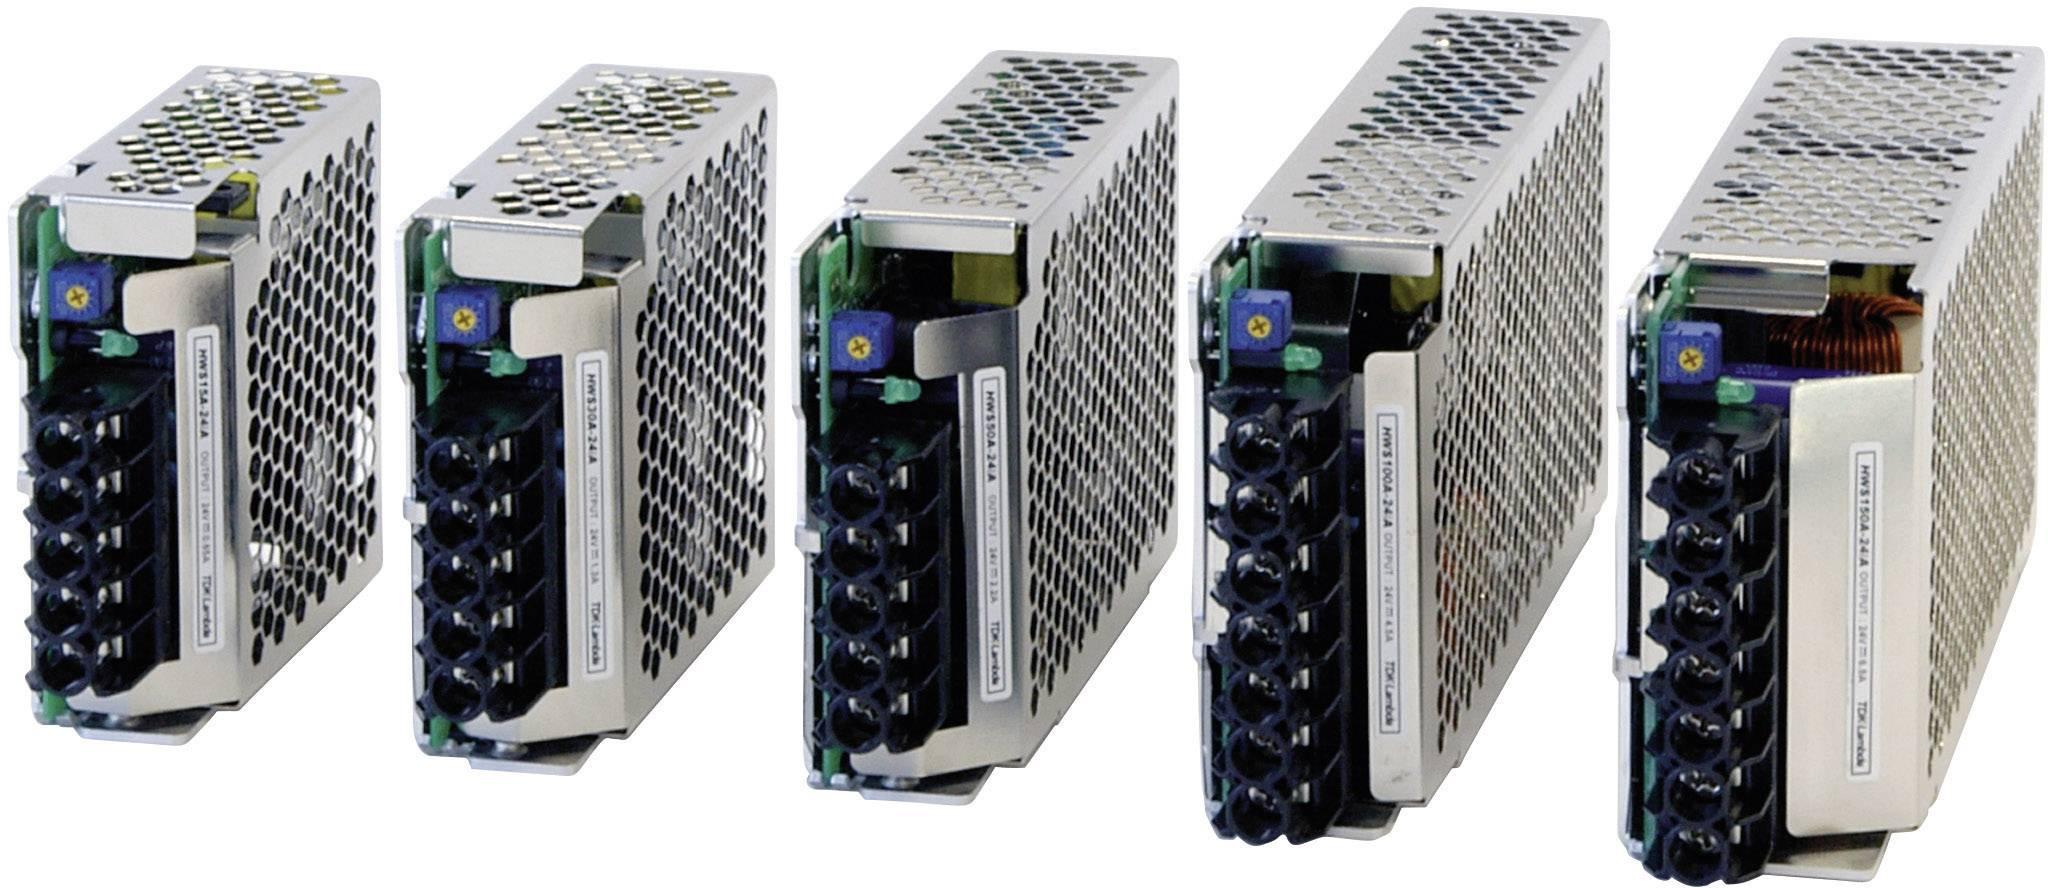 Zabudovateľný napájací zdroj TDK-Lambda HWS-100A-24/A, 24 V, 108 W